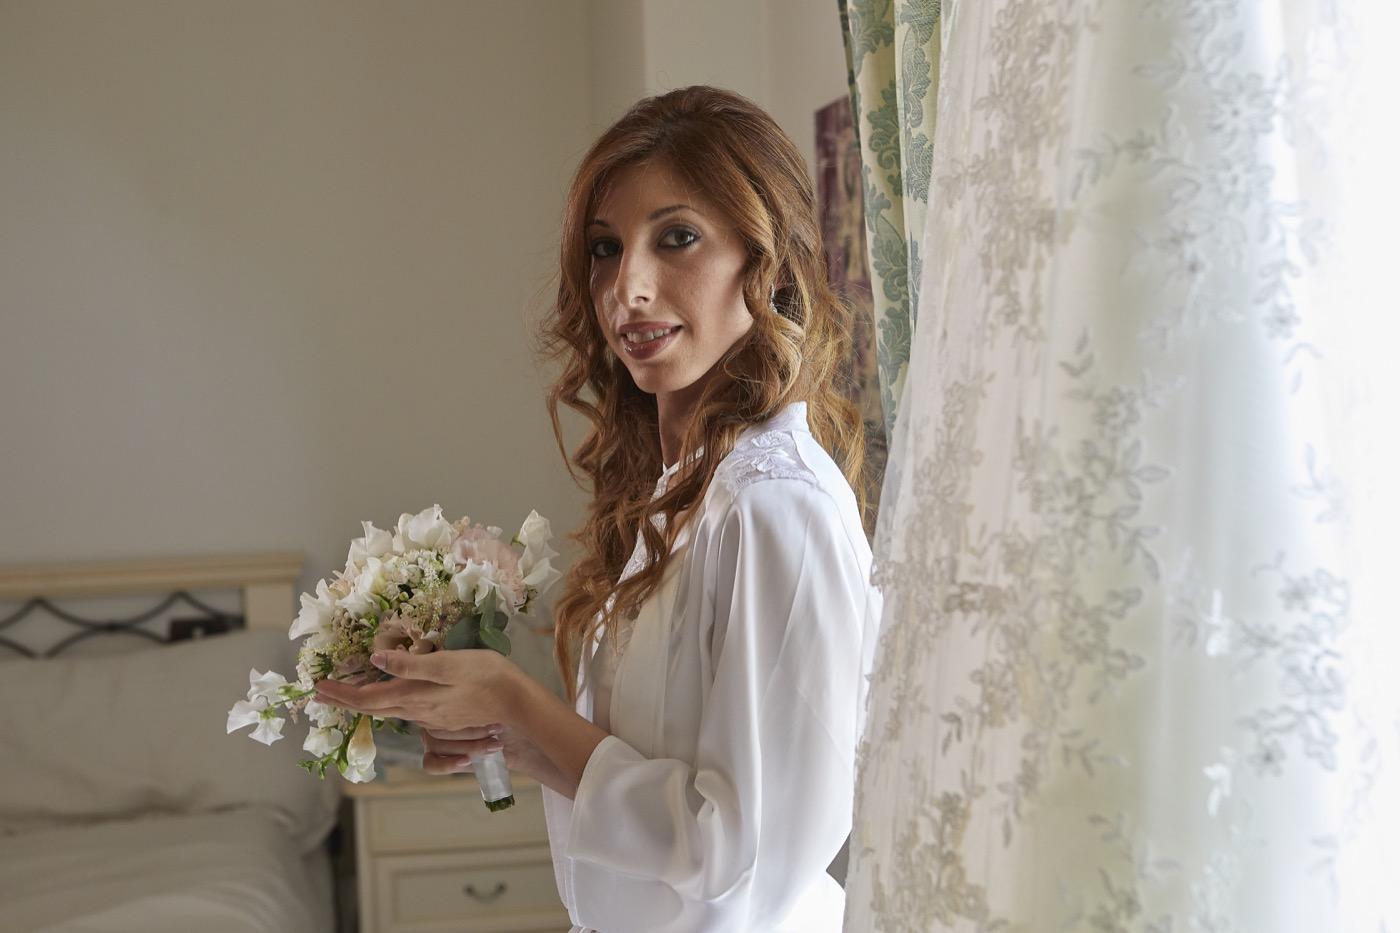 Claudio-Coppola-wedding-photographer-abbazia-7-frati-piegaro-30